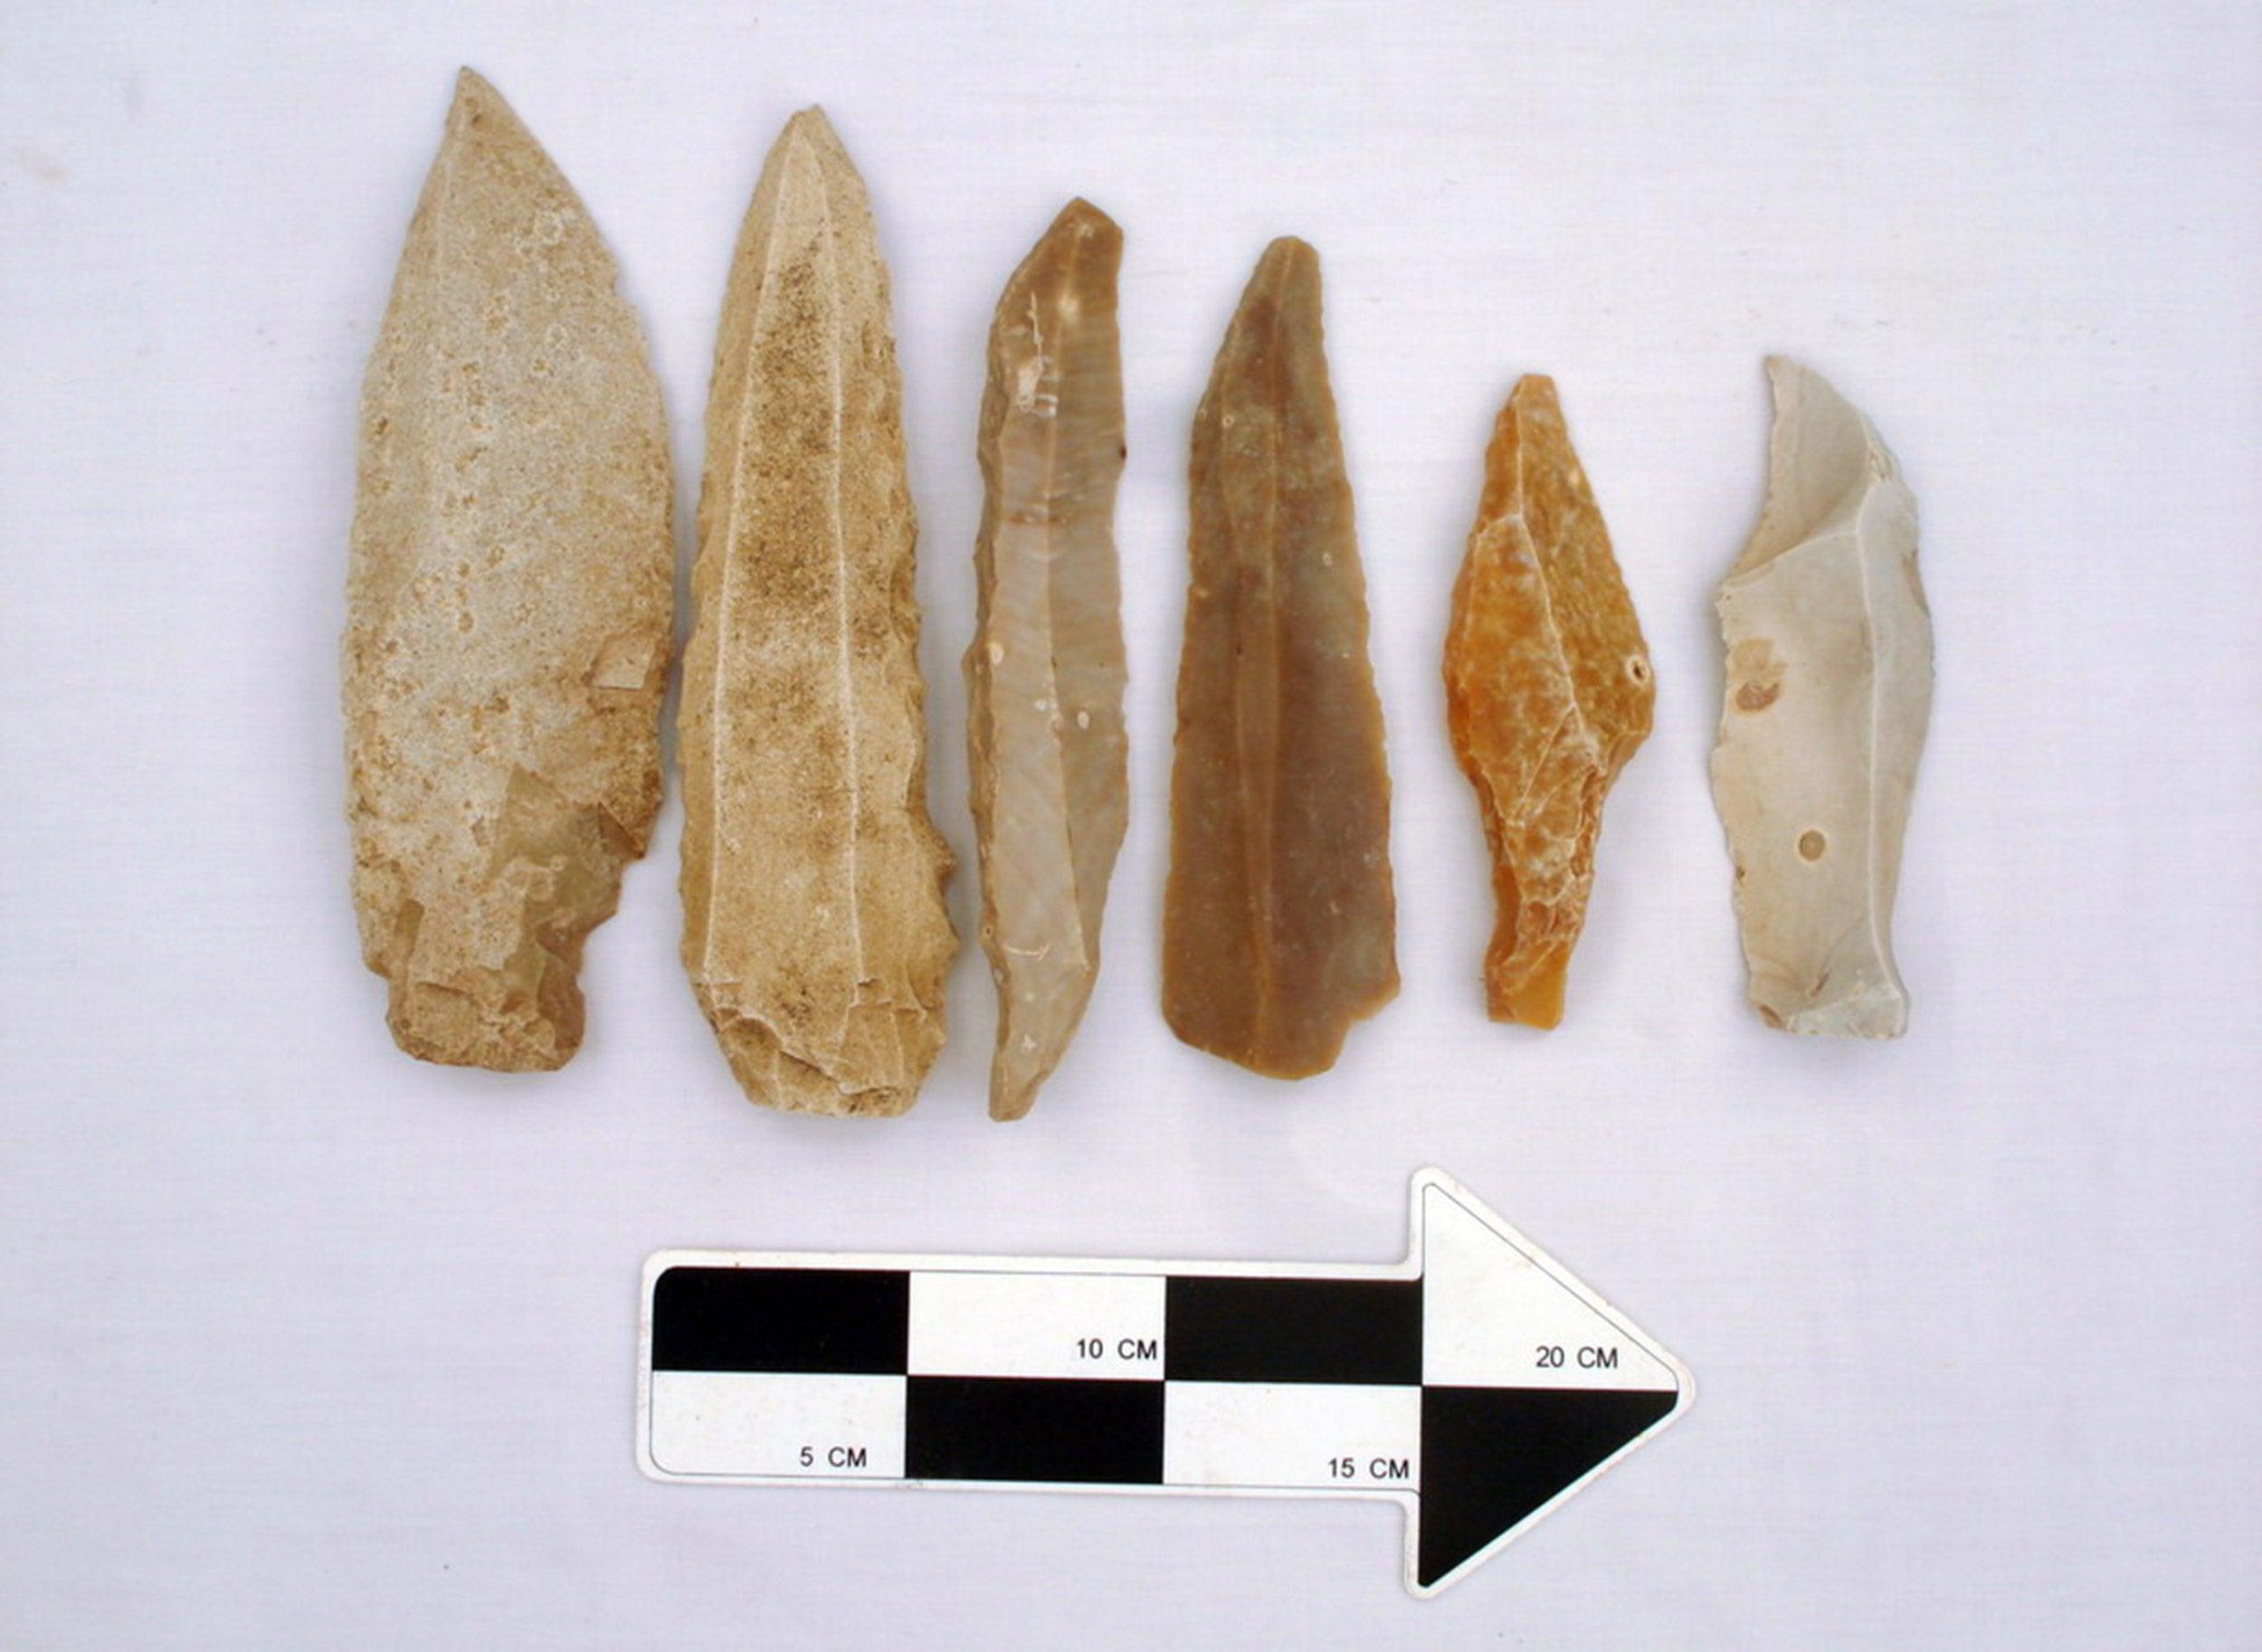 Stone tools.